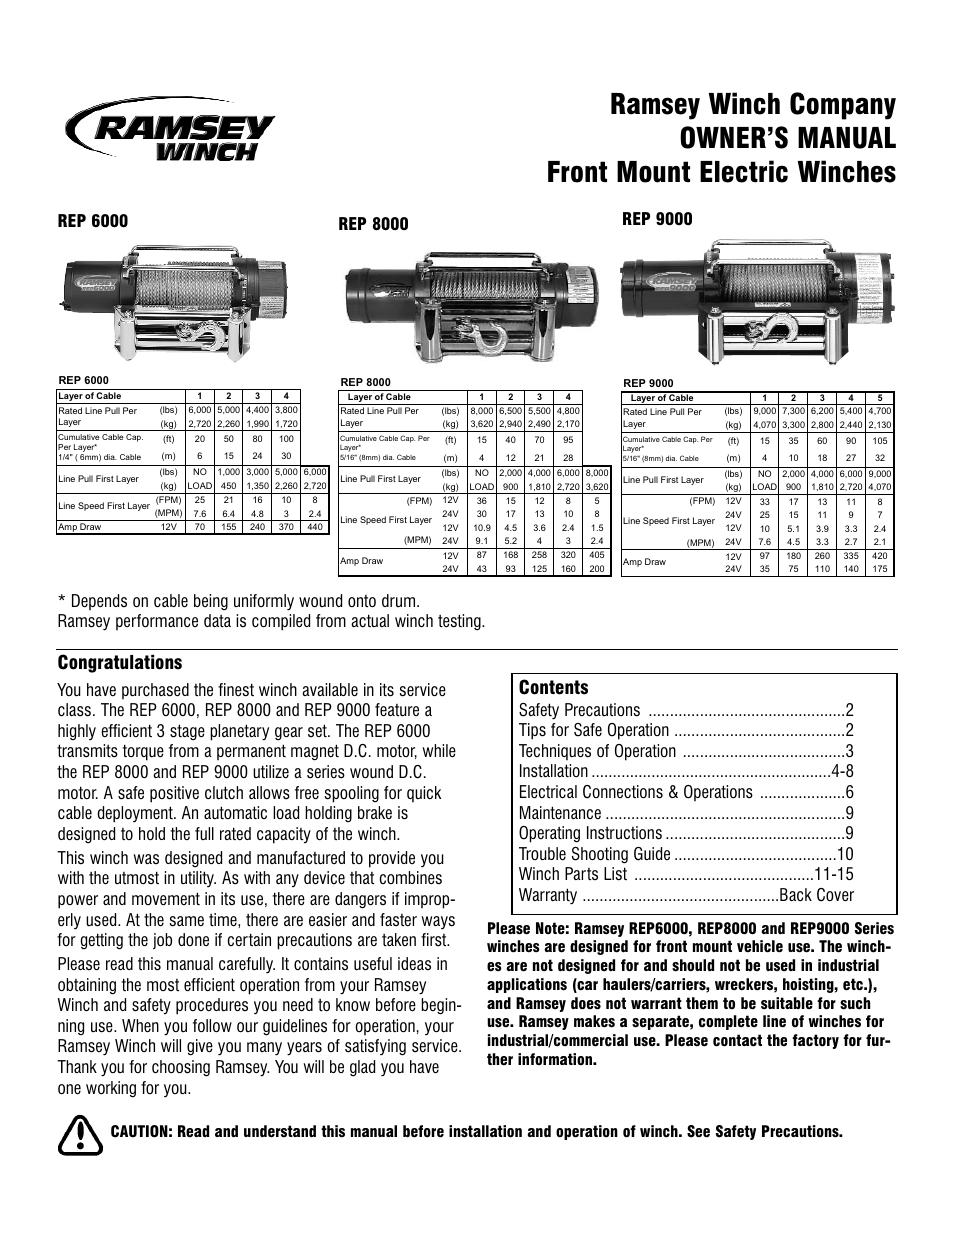 hight resolution of warn winch 9500 wiring diagram warn 8274 wiring diagram ramsey winch motor wiring diagram solenoid switch wiring diagram